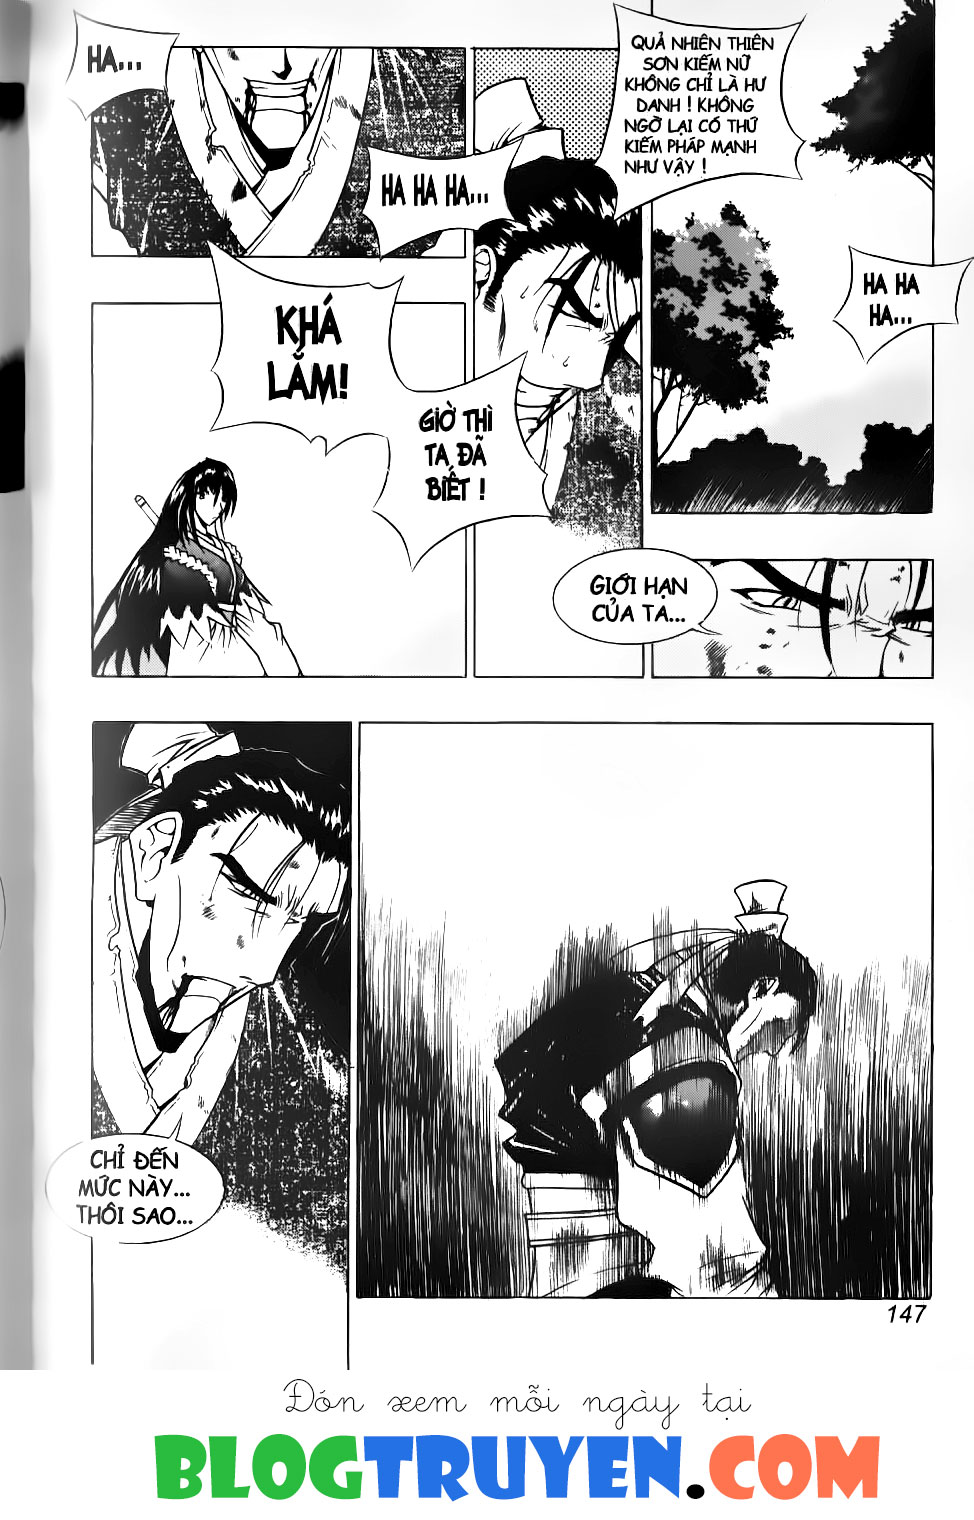 Thiên Lang Liệt Truyện Scan Chap 87 - Truyen.Chap.VN